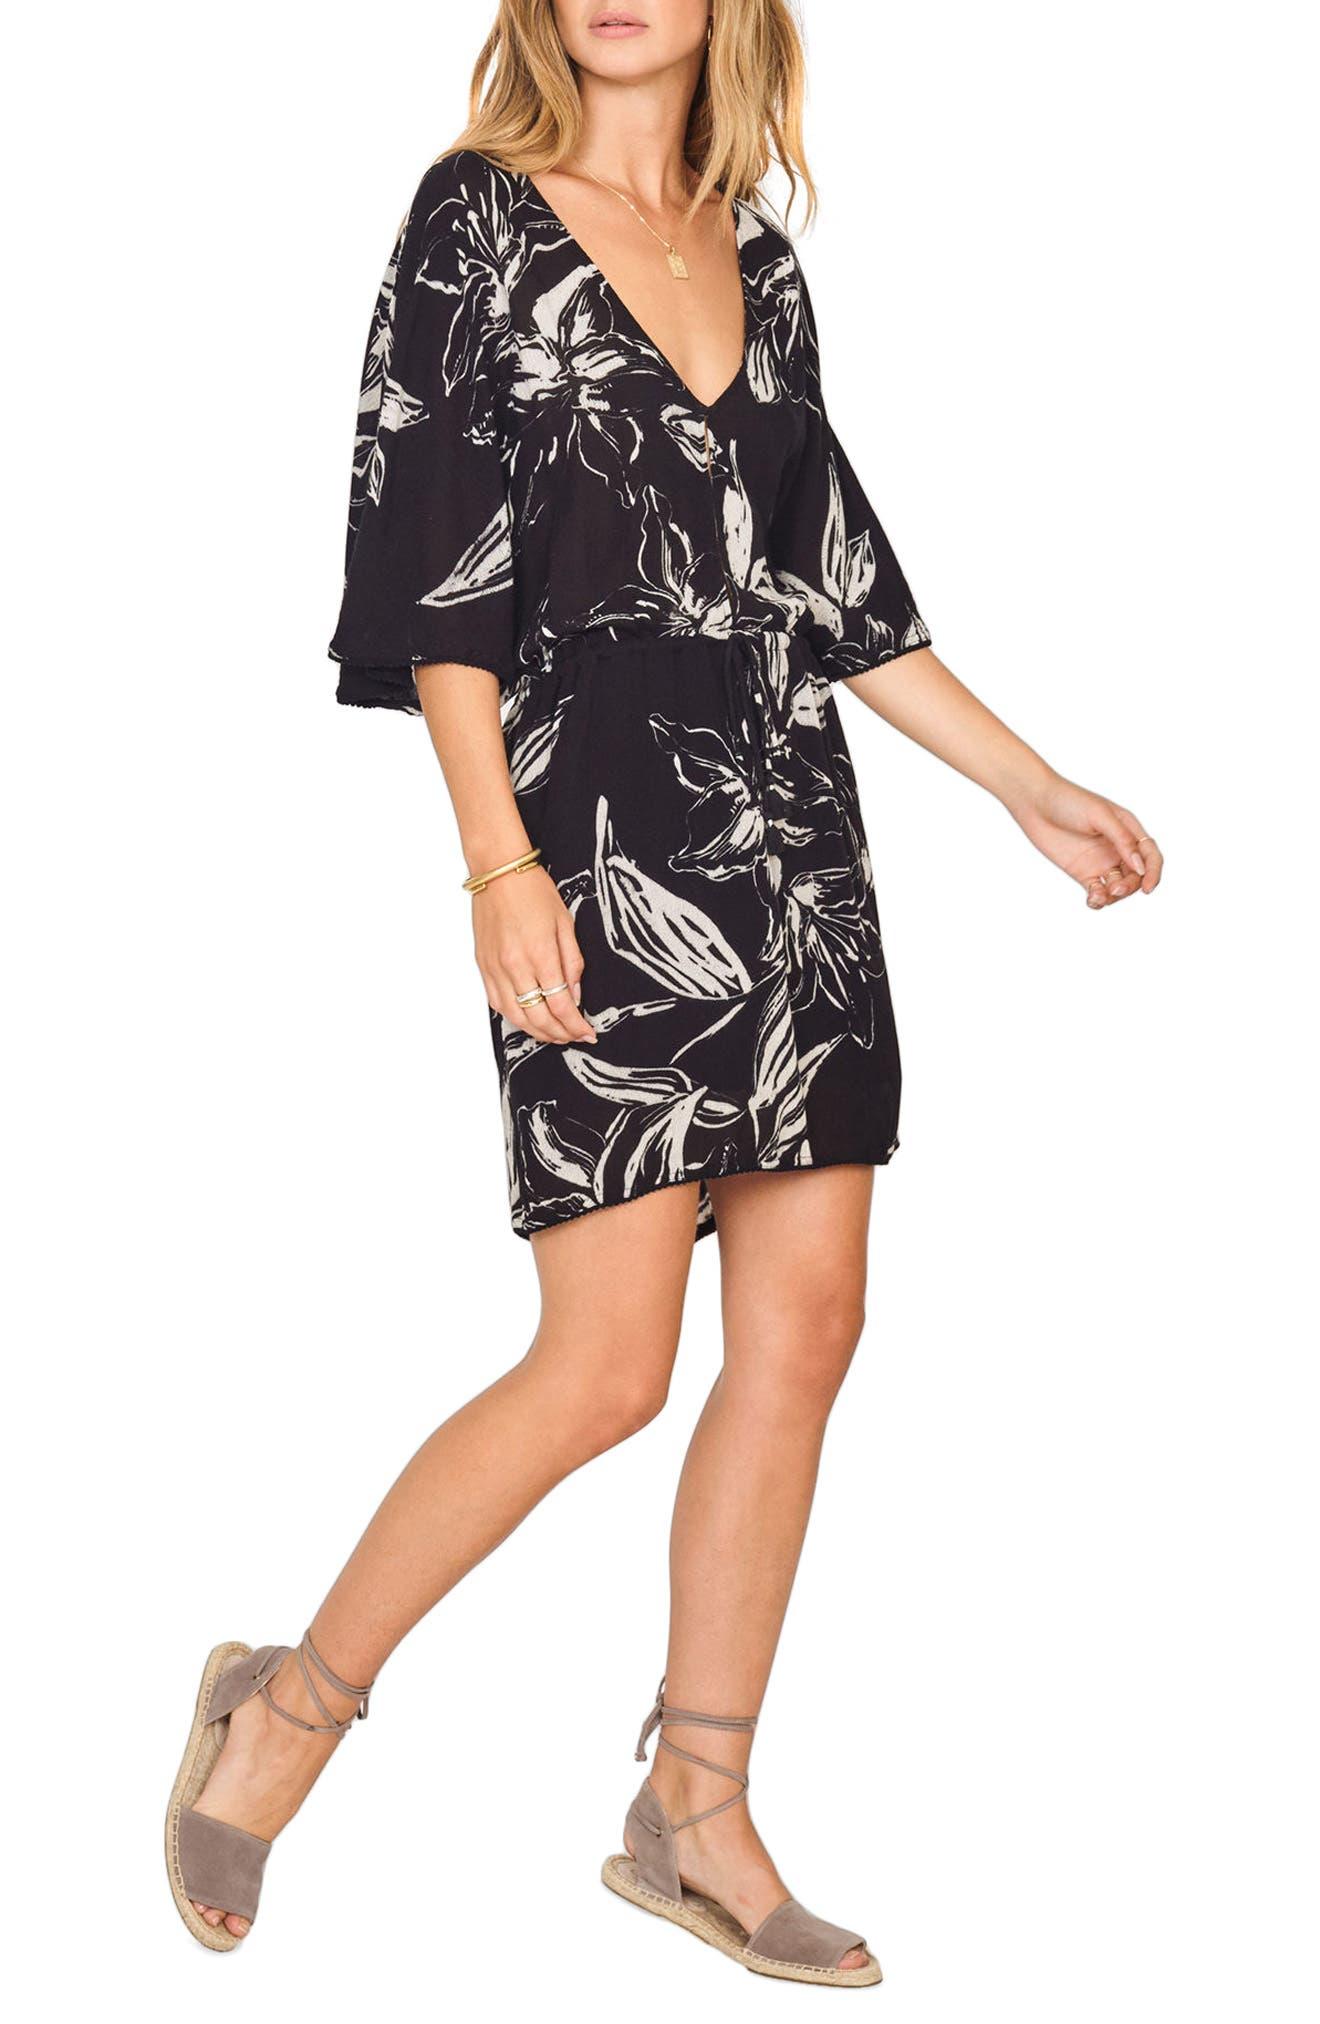 Amuse Society Cross My Heart Floral Print Dress